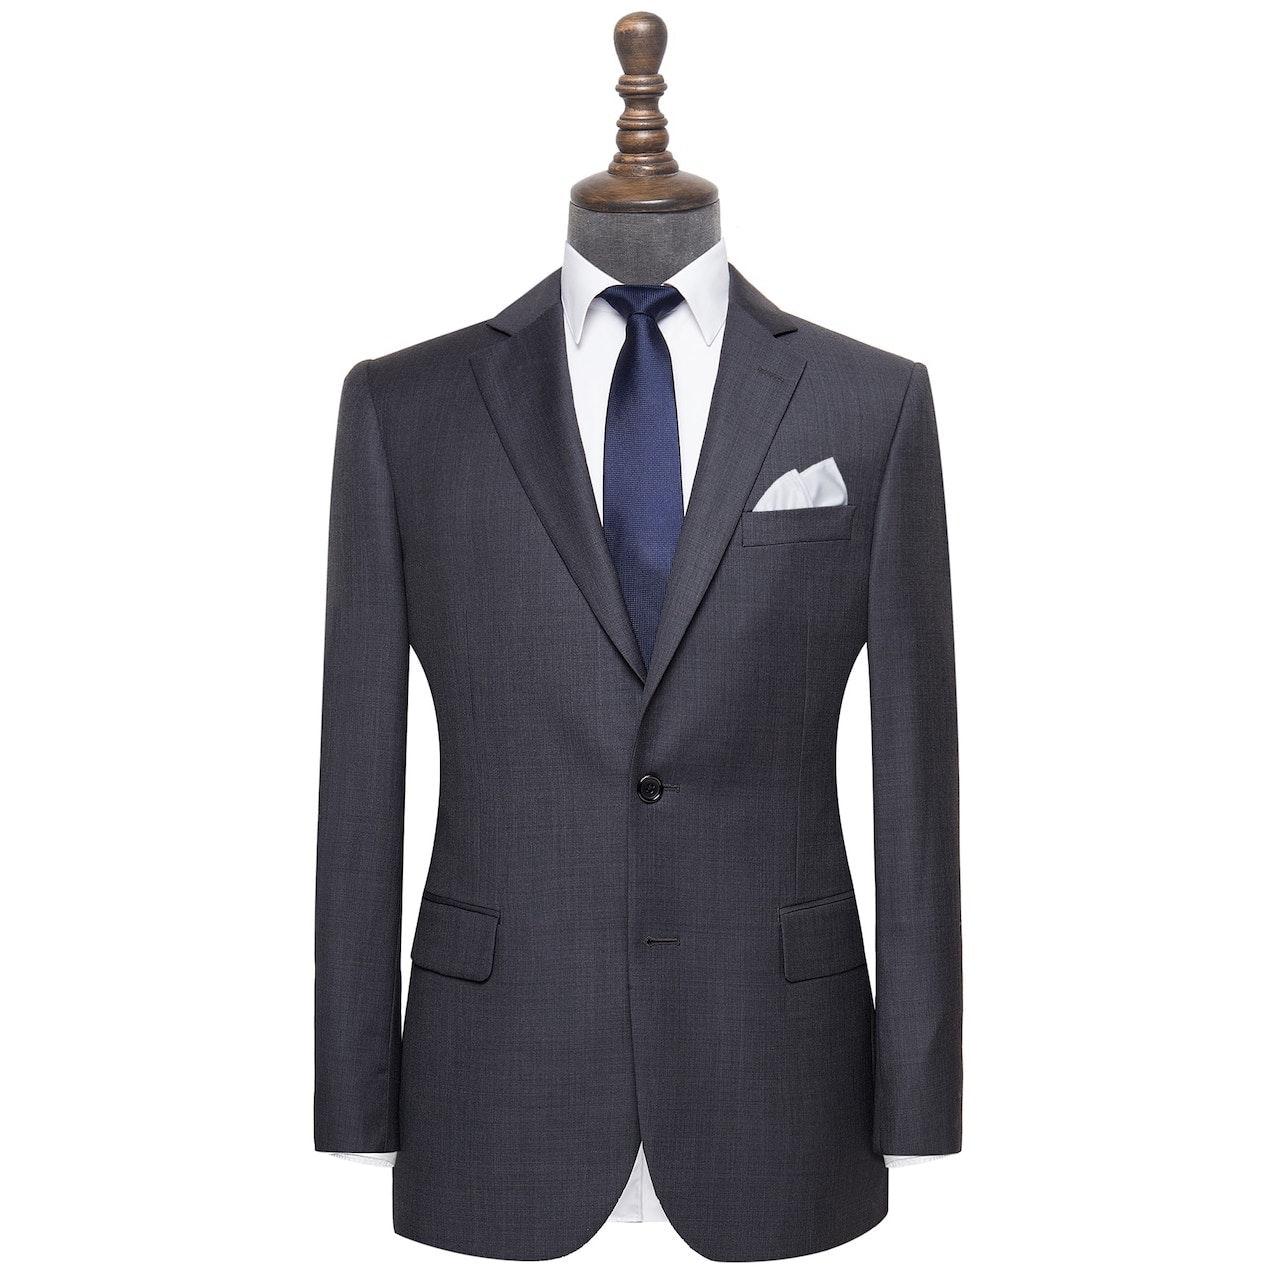 InStitchu Suit Fabric 35